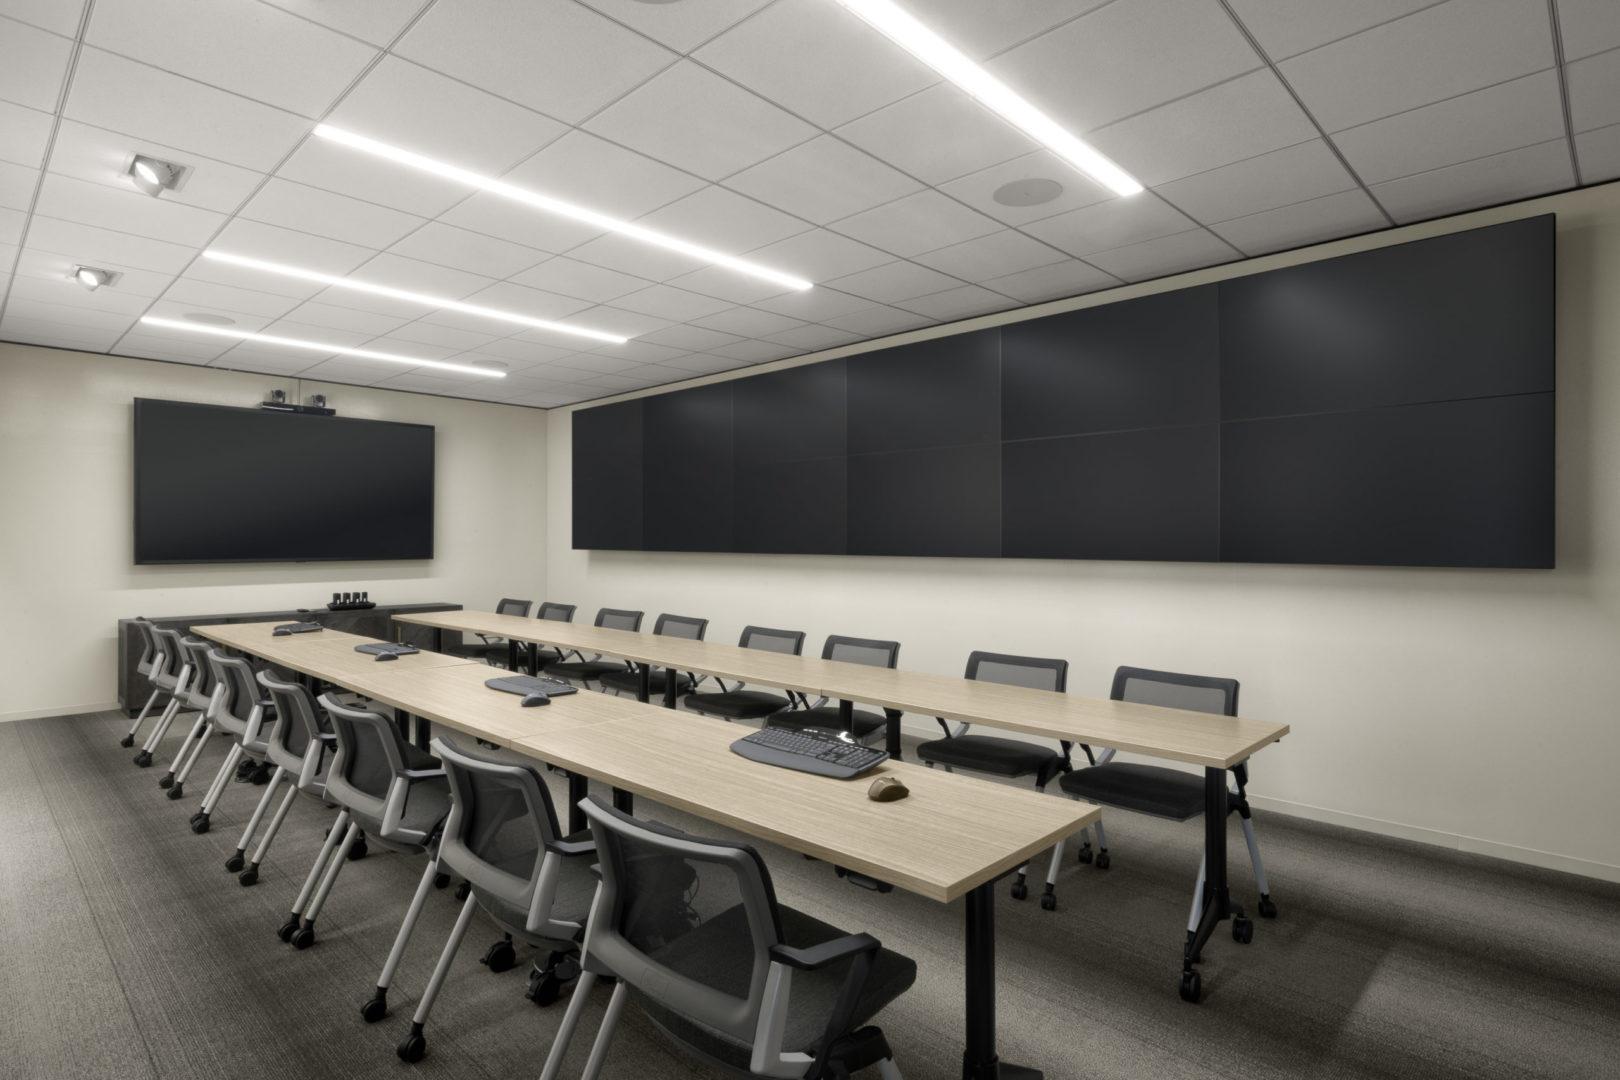 Encino Energy_Corporate Training Room Design